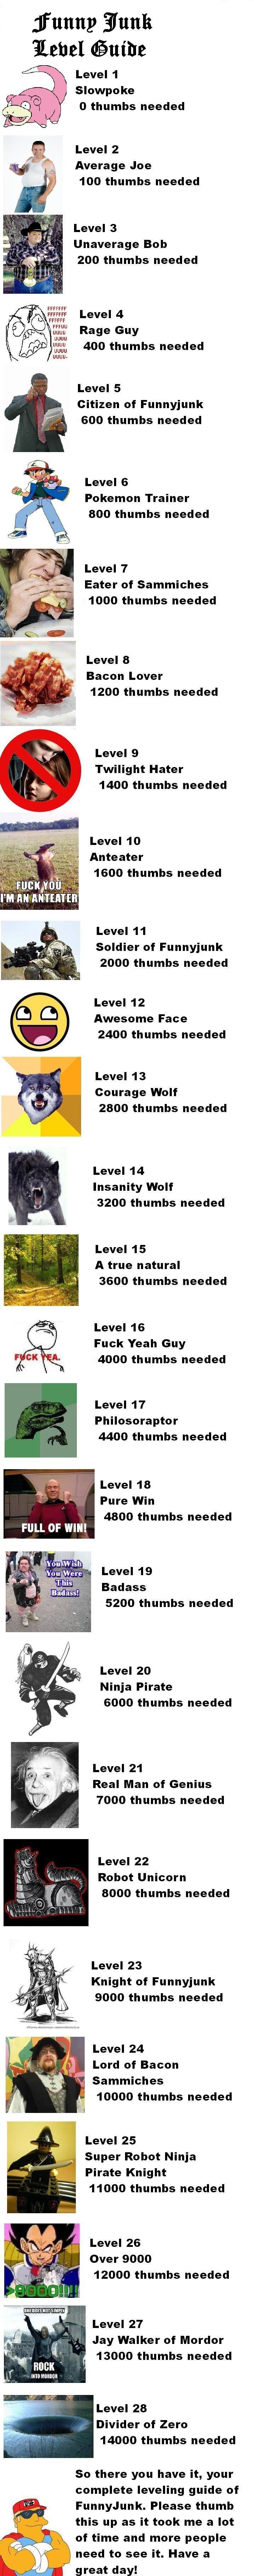 FunnyJunk Level Guide. . funny 3121121 (Hittite Level 1 Slowpoke o thumbs needed Level 2 Average Joe 100 thumbs needed Level 3 Unaverage Bob 200 thumbs needed L